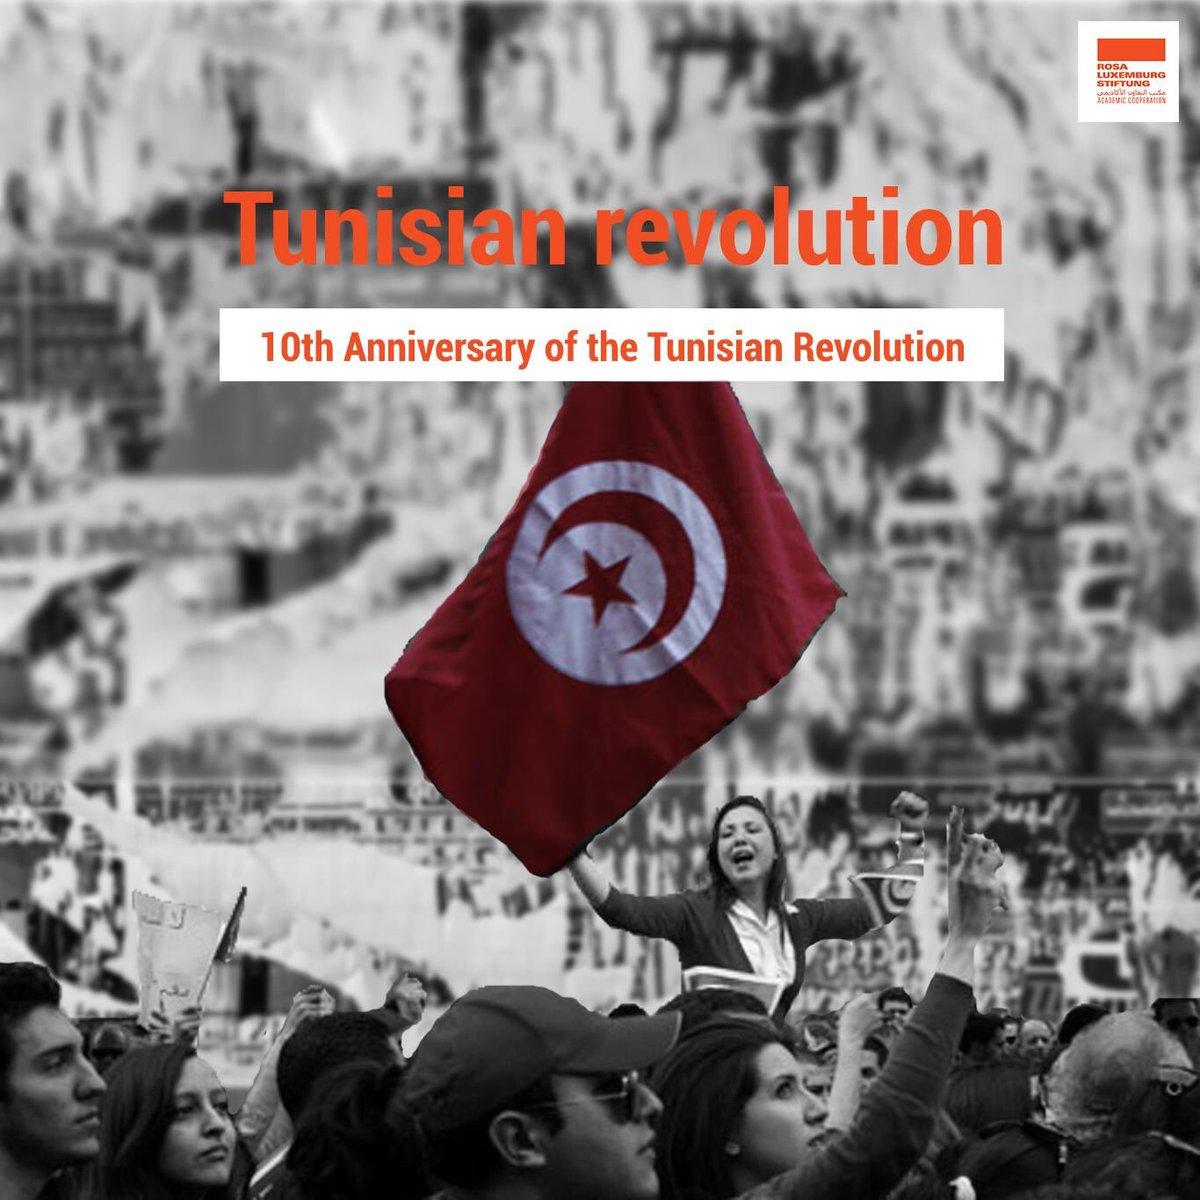 Today marks the #10thAnniversary of the #Tunisian #Revolution #otd